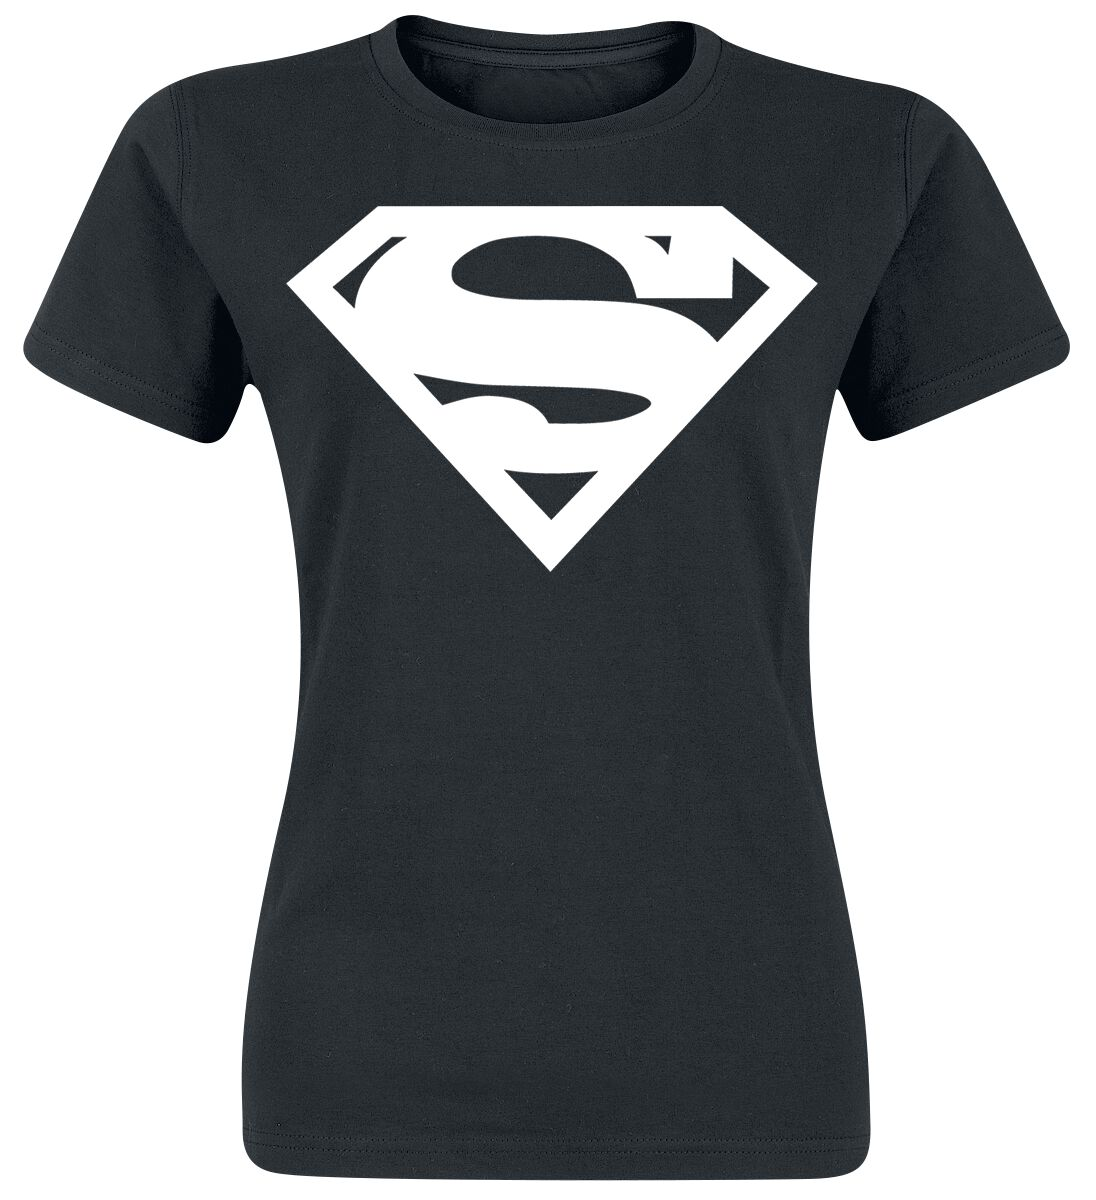 Merch dla Fanów - Koszulki - Koszulka damska Superman Logo Koszulka damska czarny - 369652